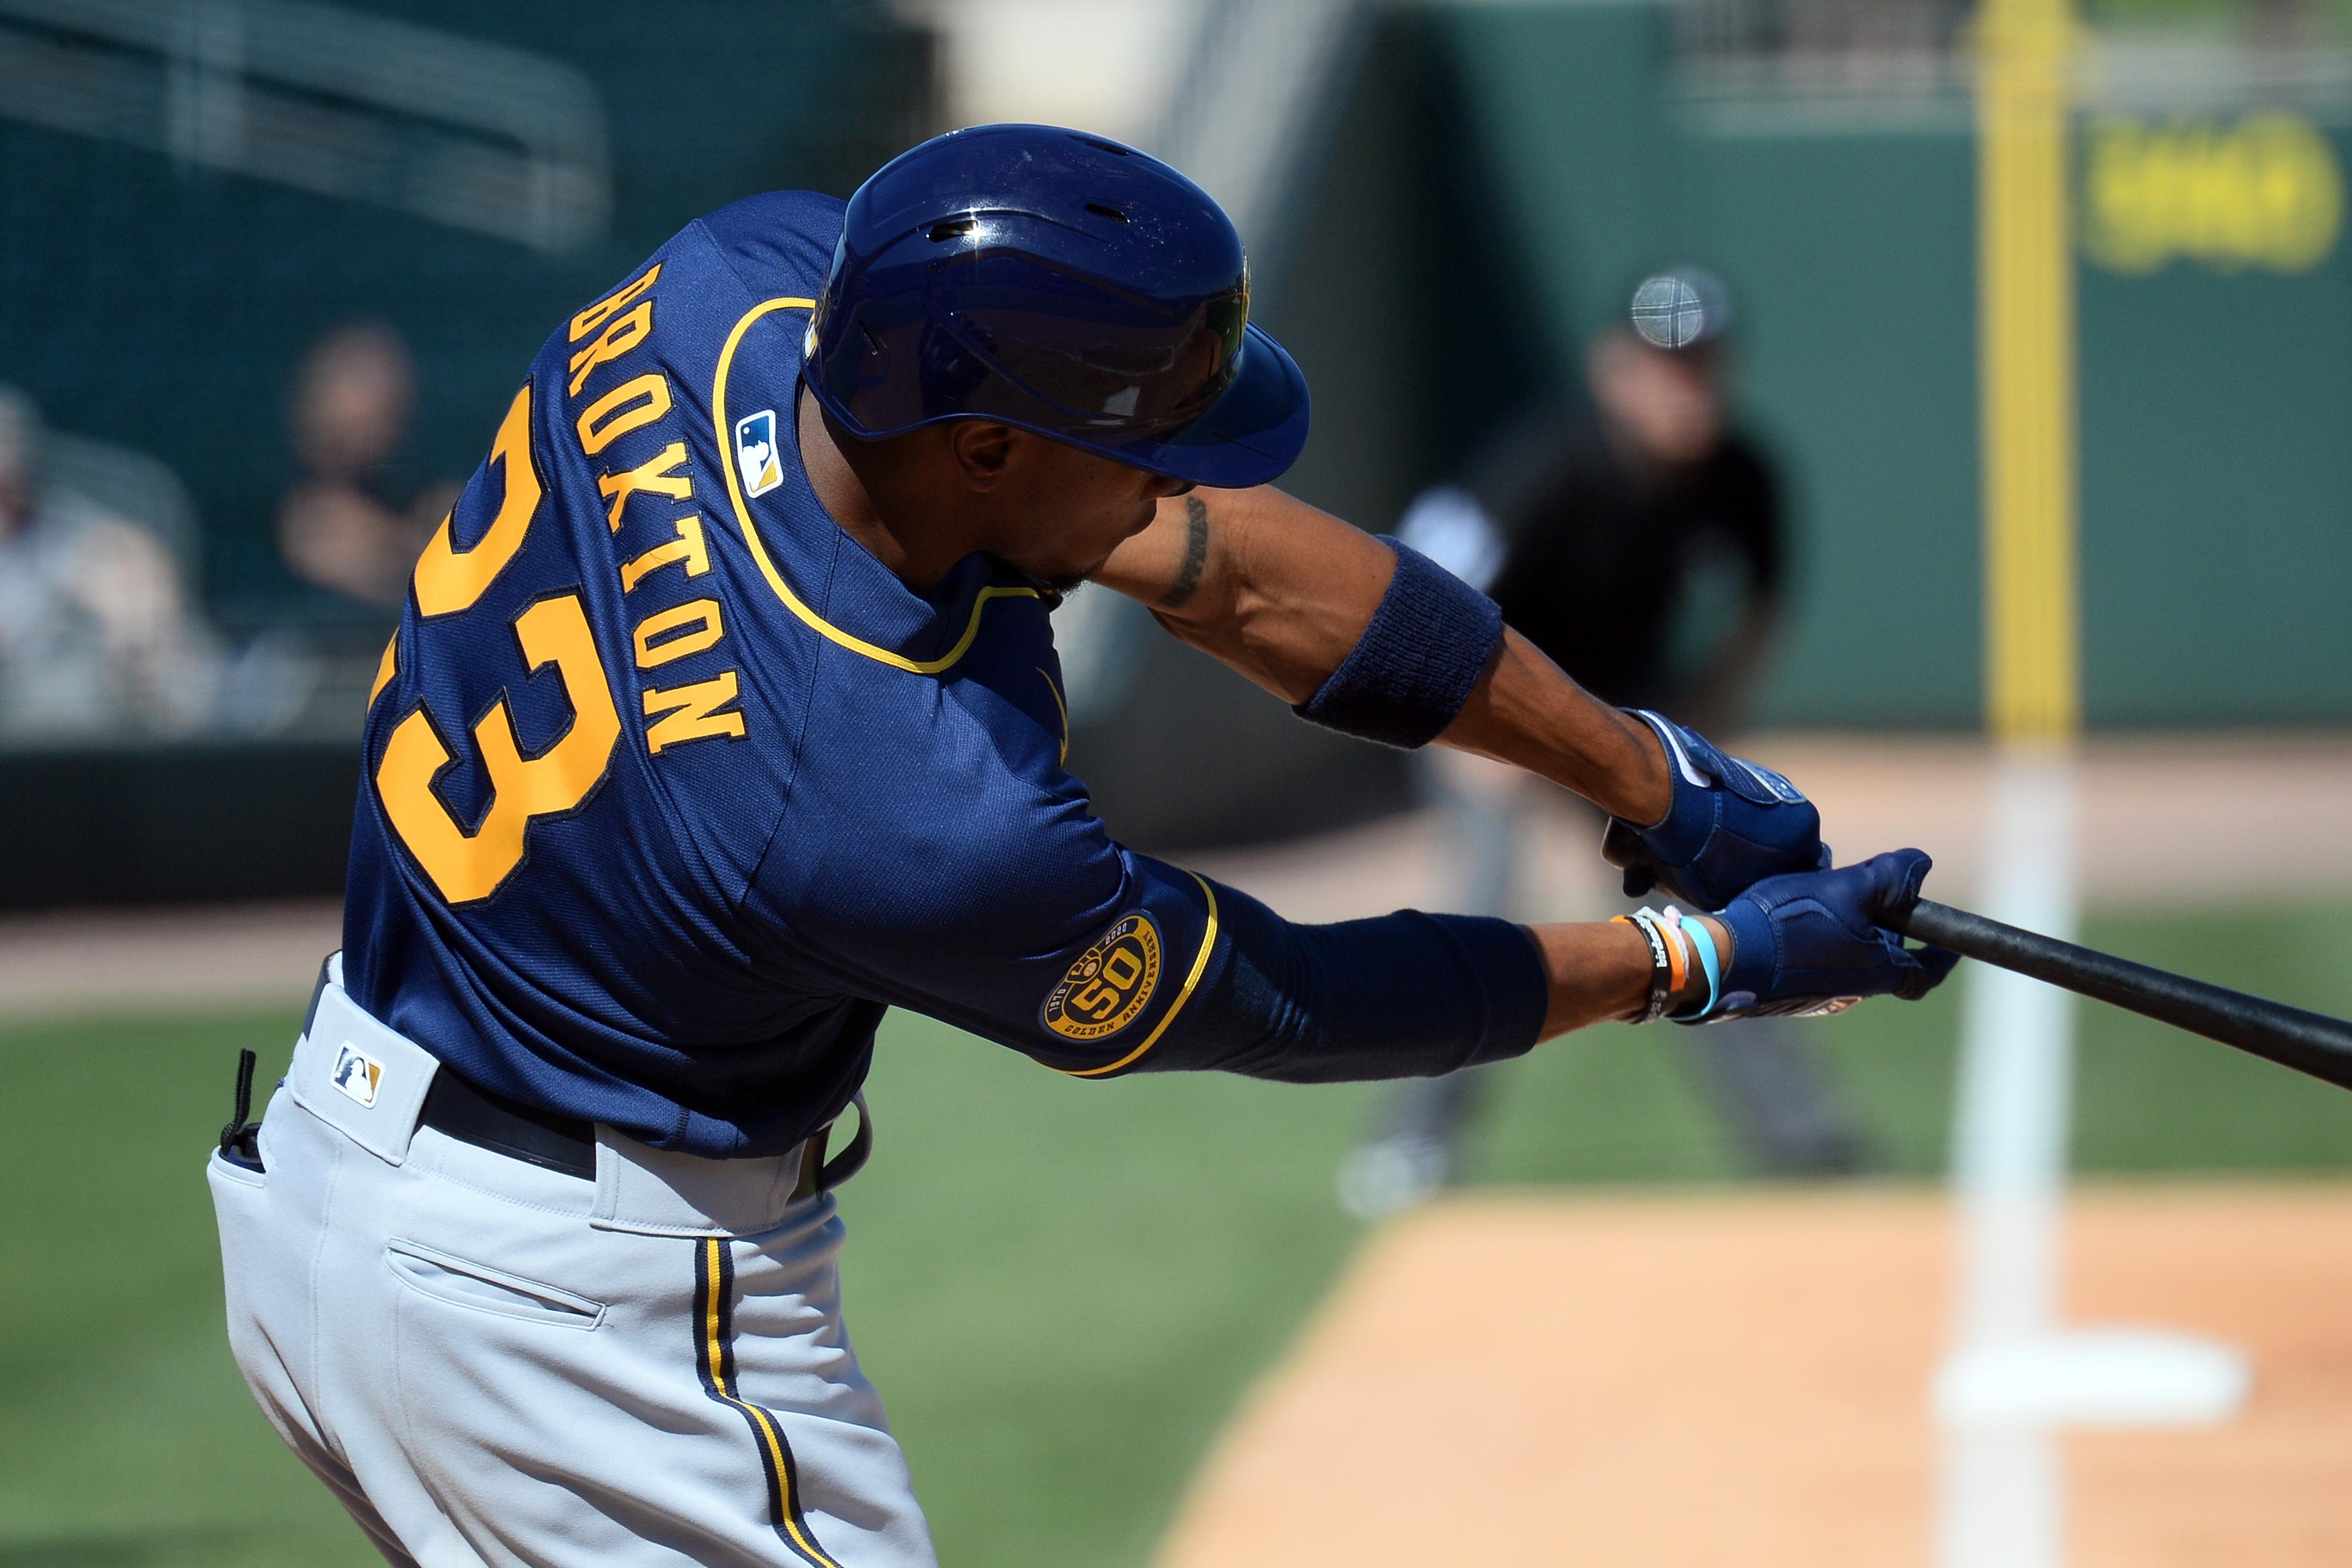 MLB: Spring Training-Milwaukee Brewers at Oakland Athletics